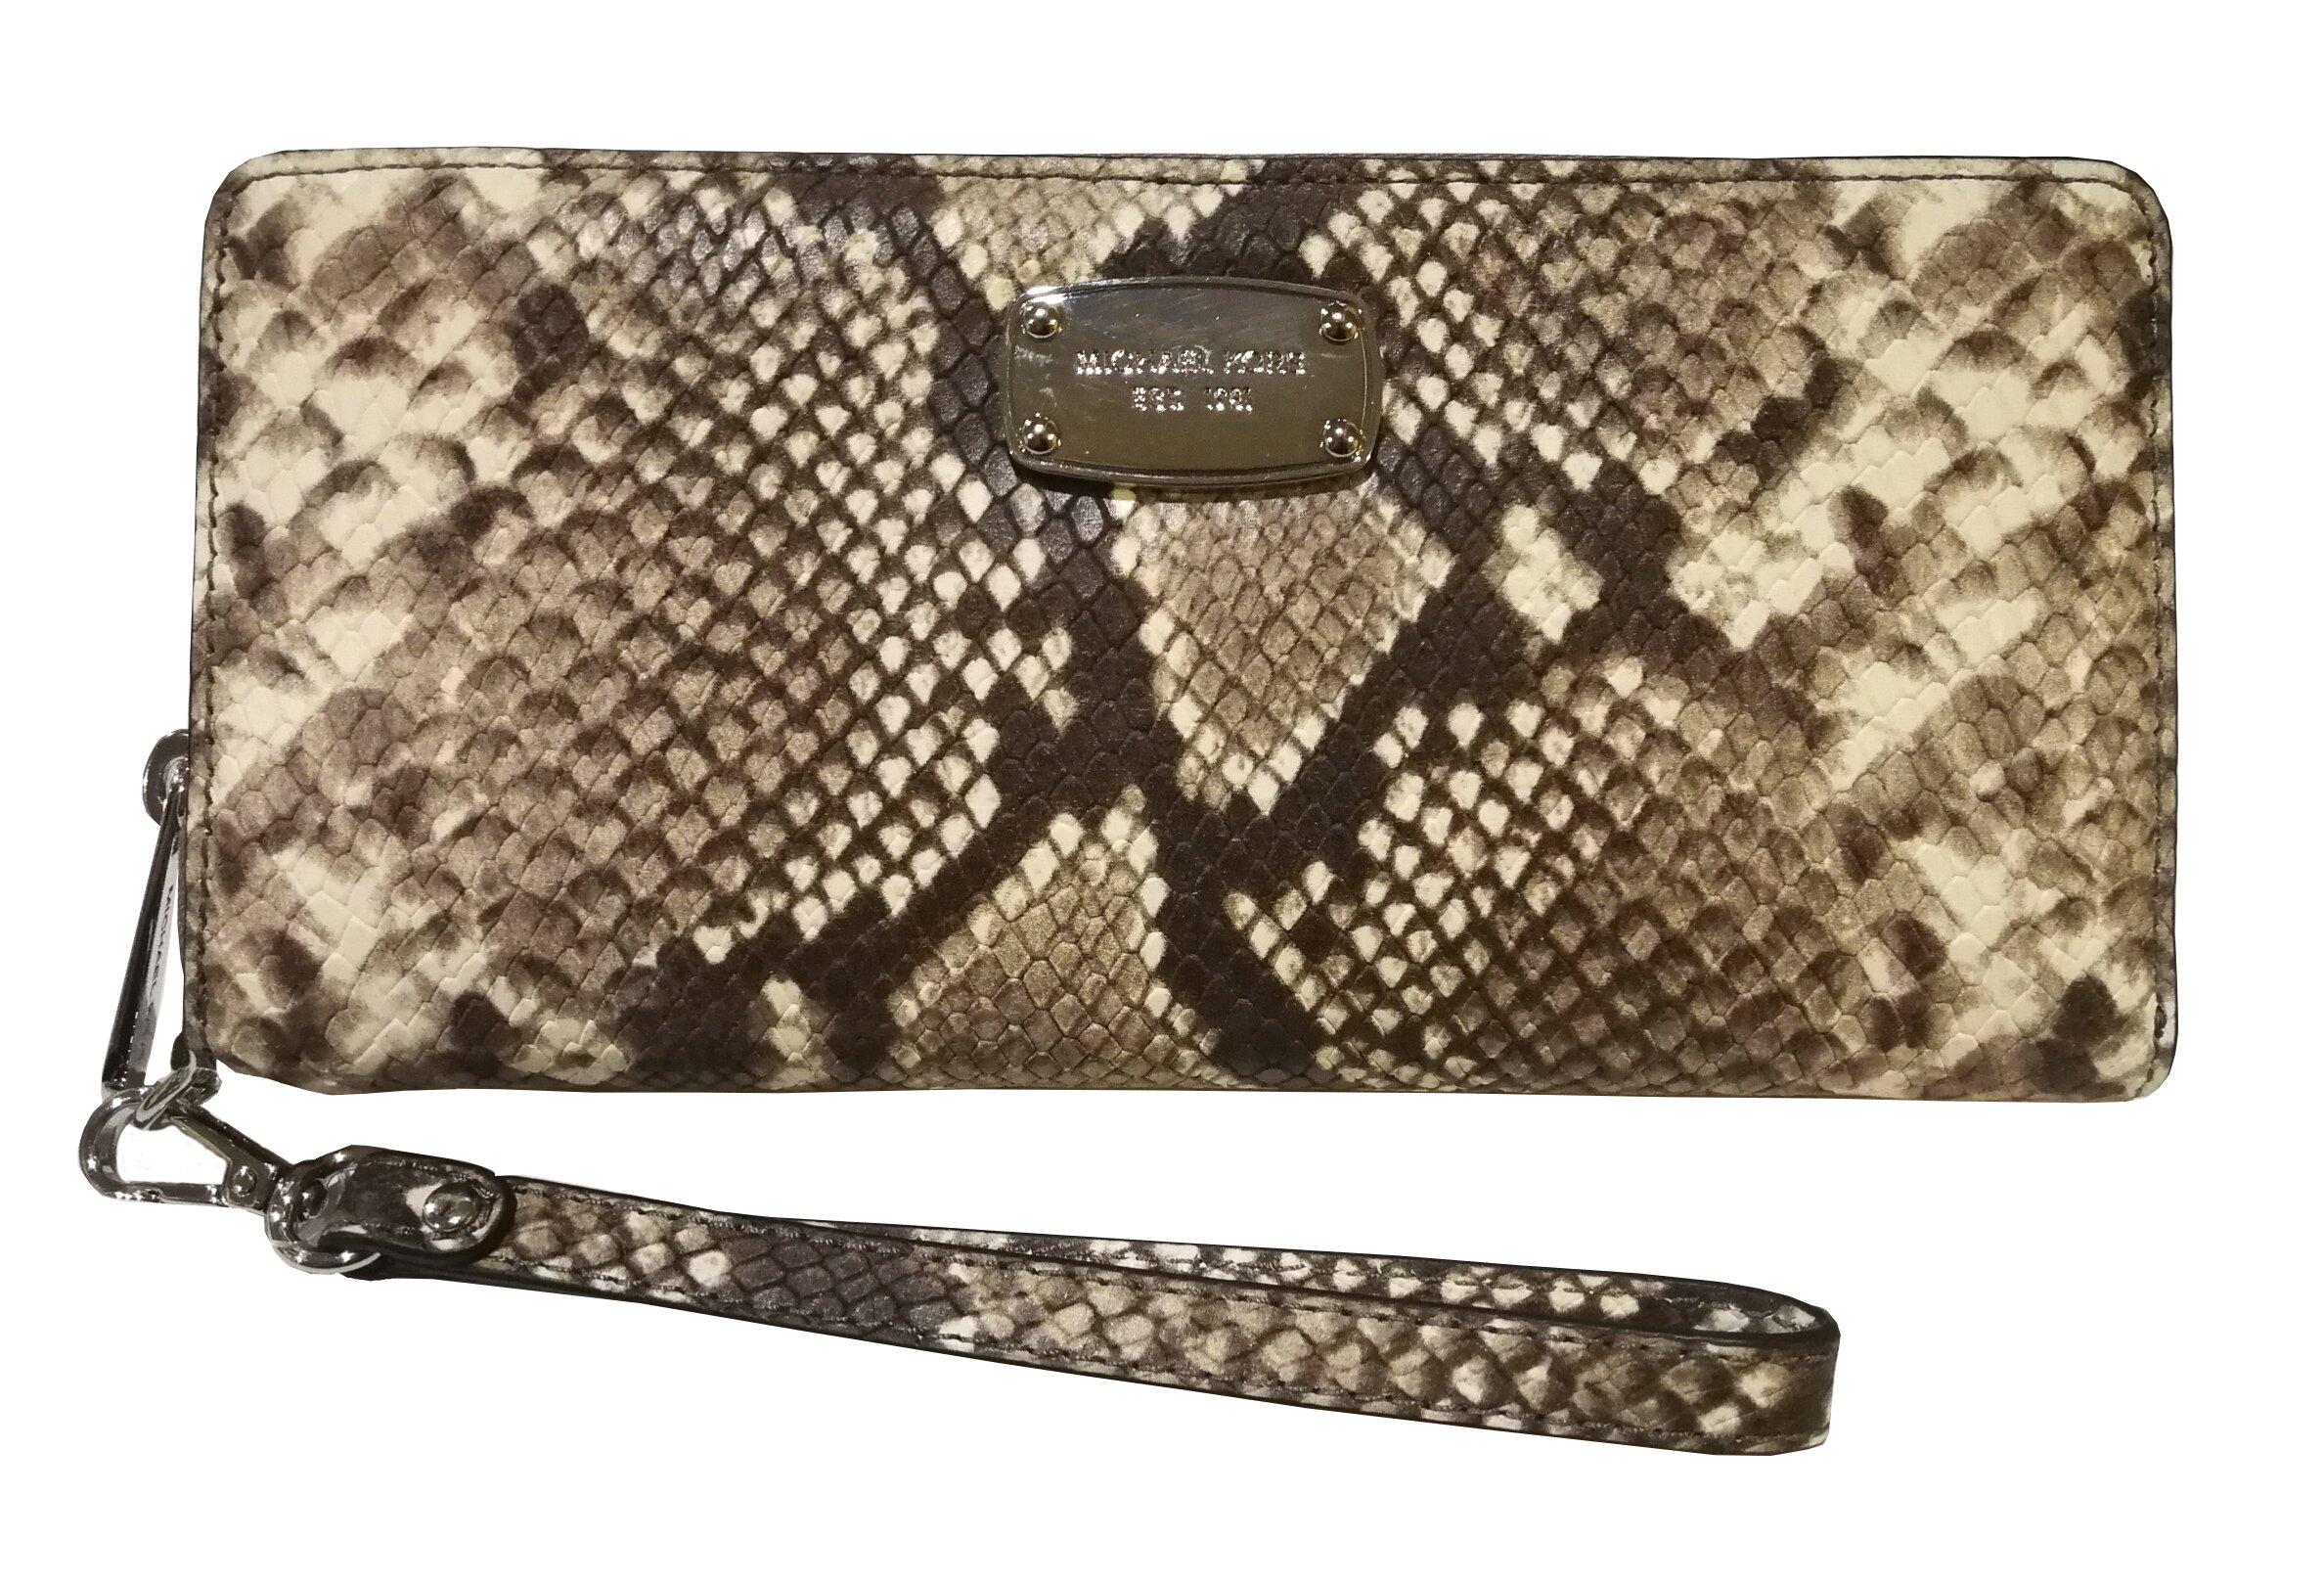 Michael Kors Womens Jet Set Item Travel Continental Embossed Leather Zip Around Wristlet Wallet Natural